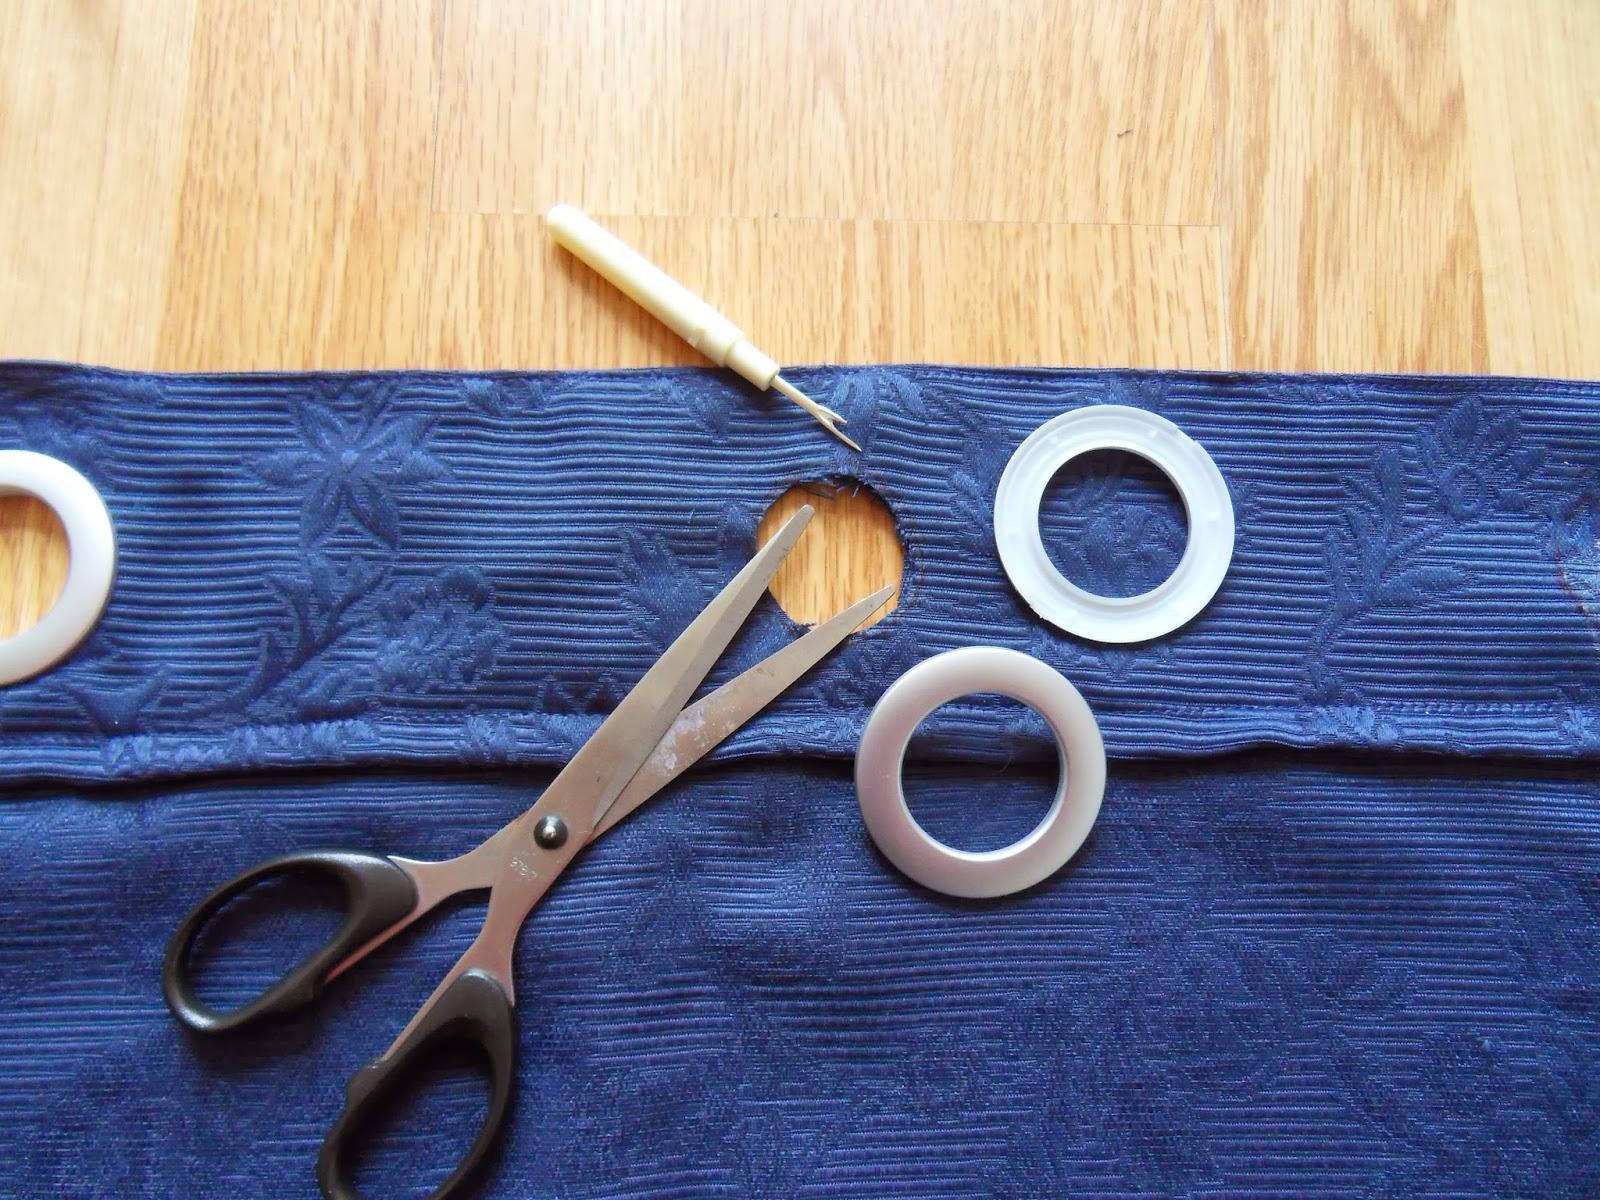 Catching Threads: Gordijnen naaien